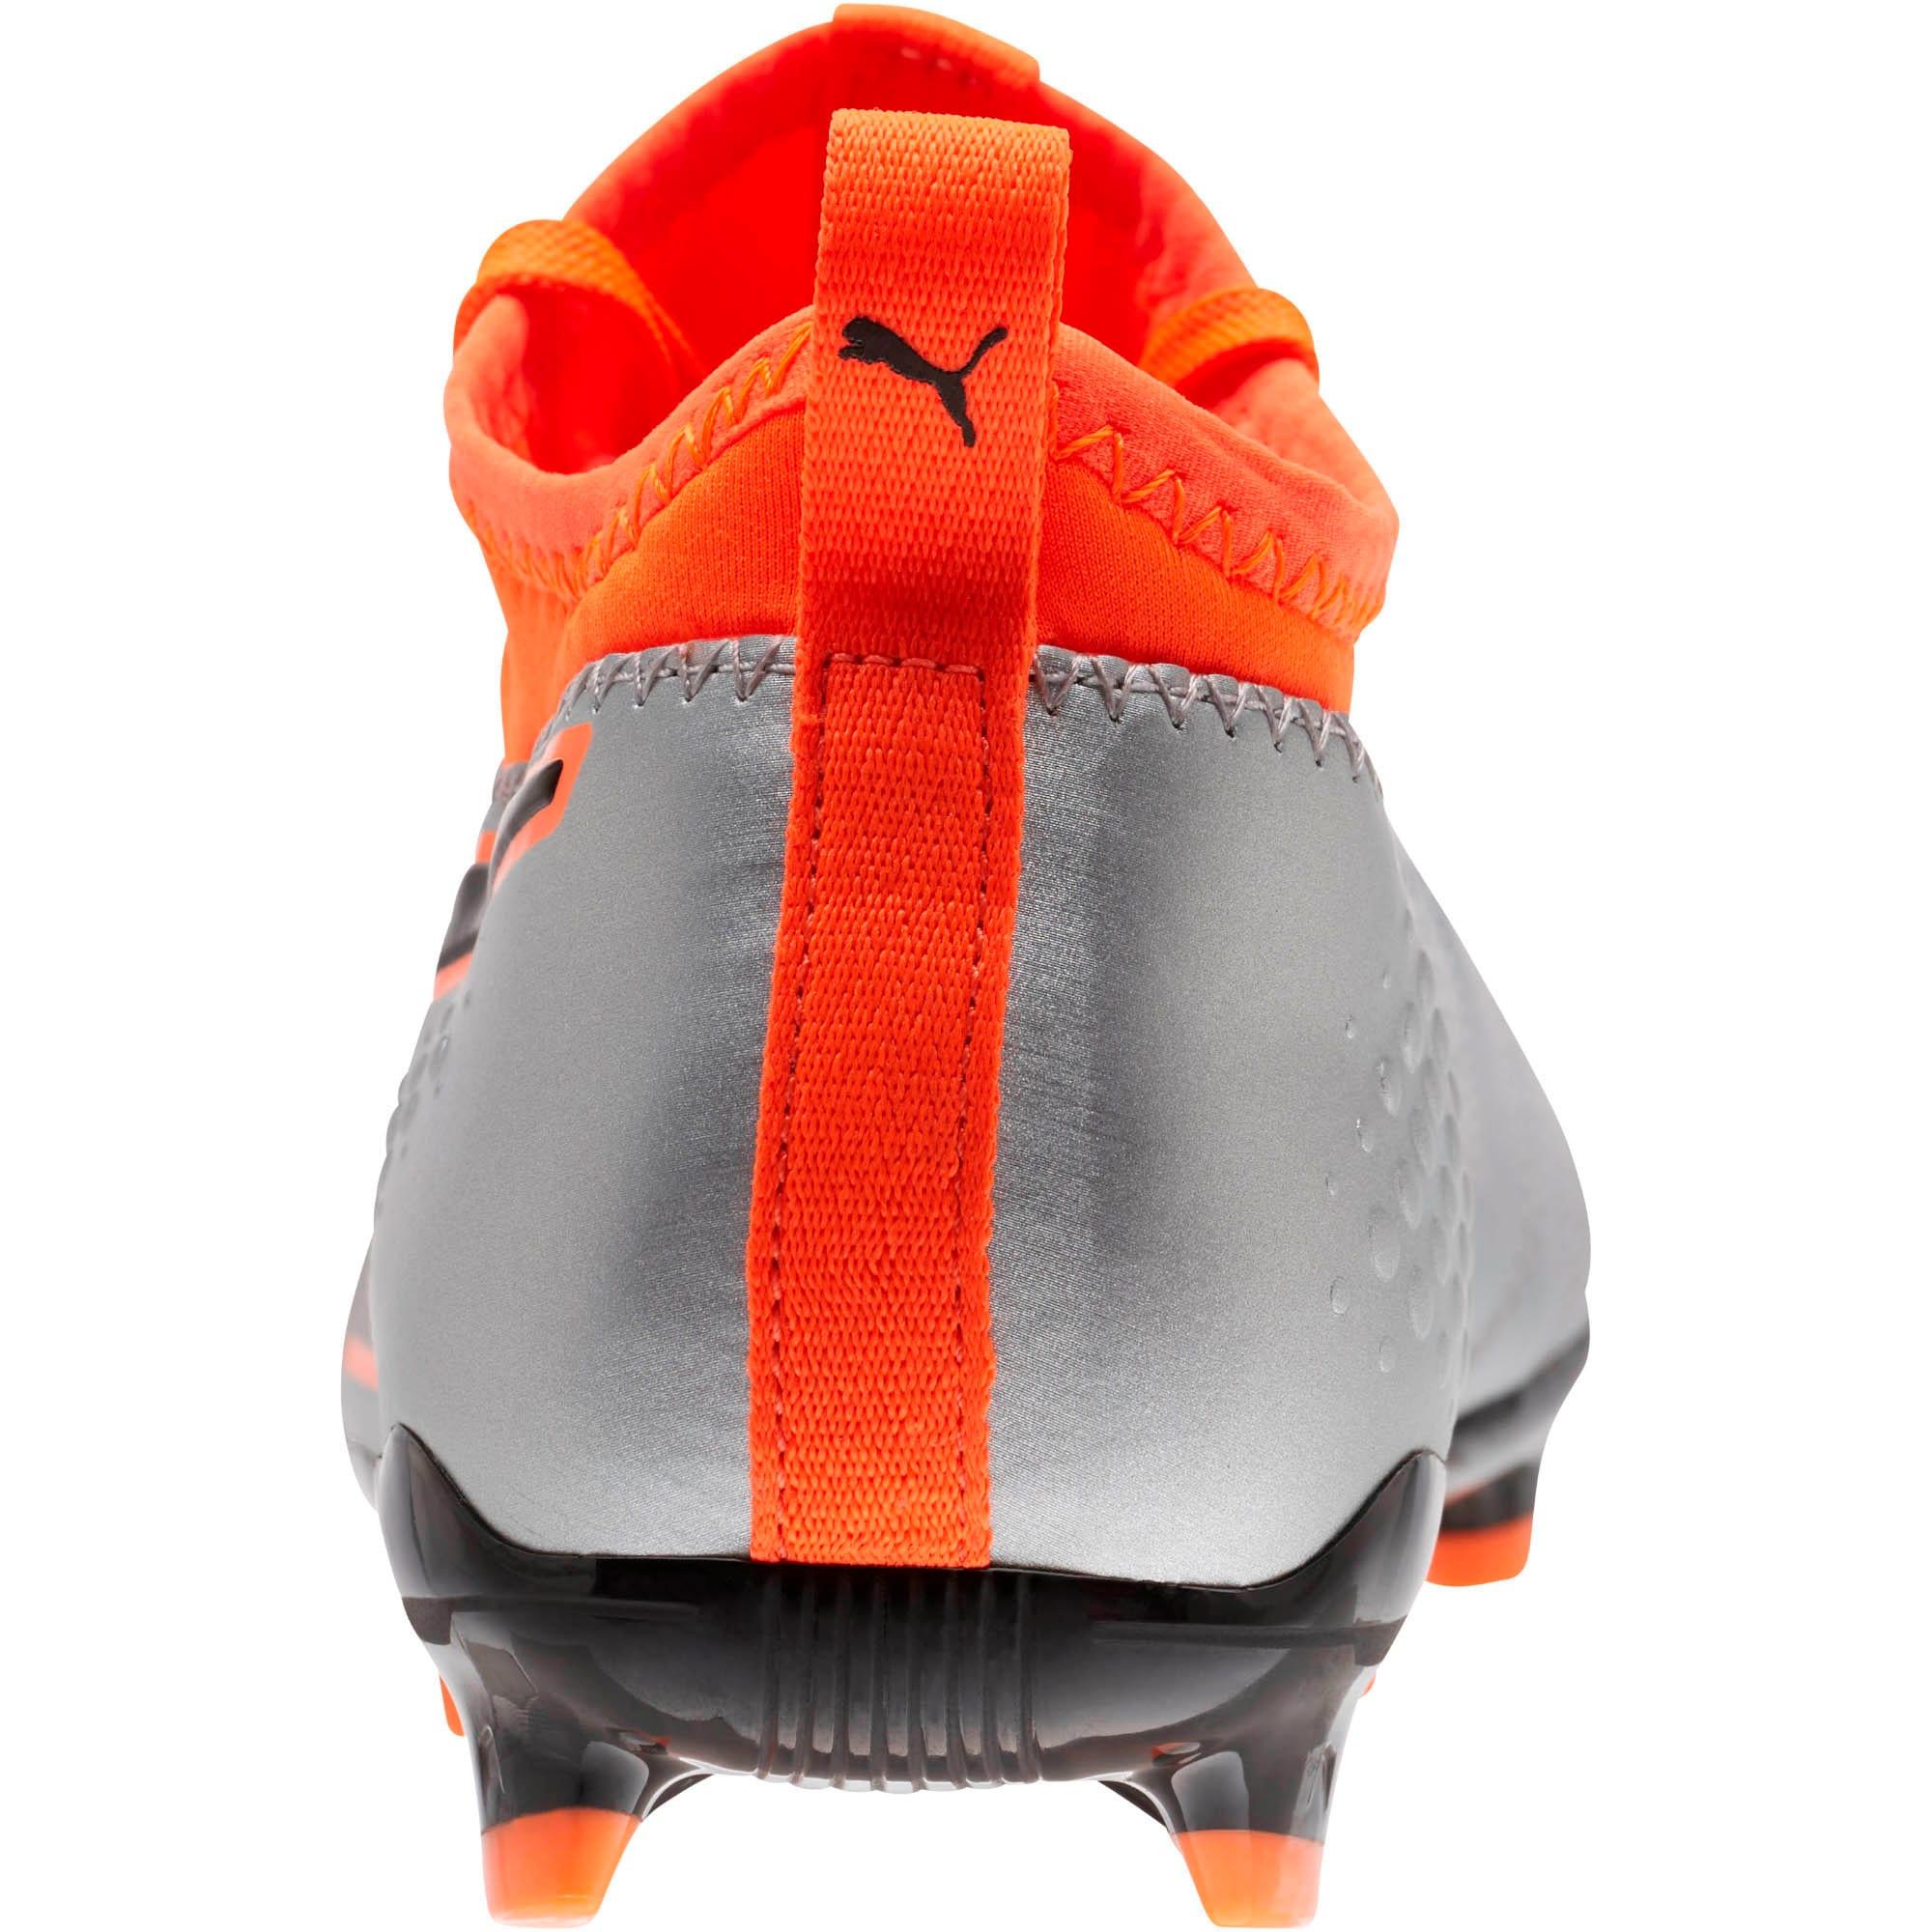 Thumbnail 4 of PUMA ONE 3 FG Soccer Cleats JR, Silver-Orange-Black, medium